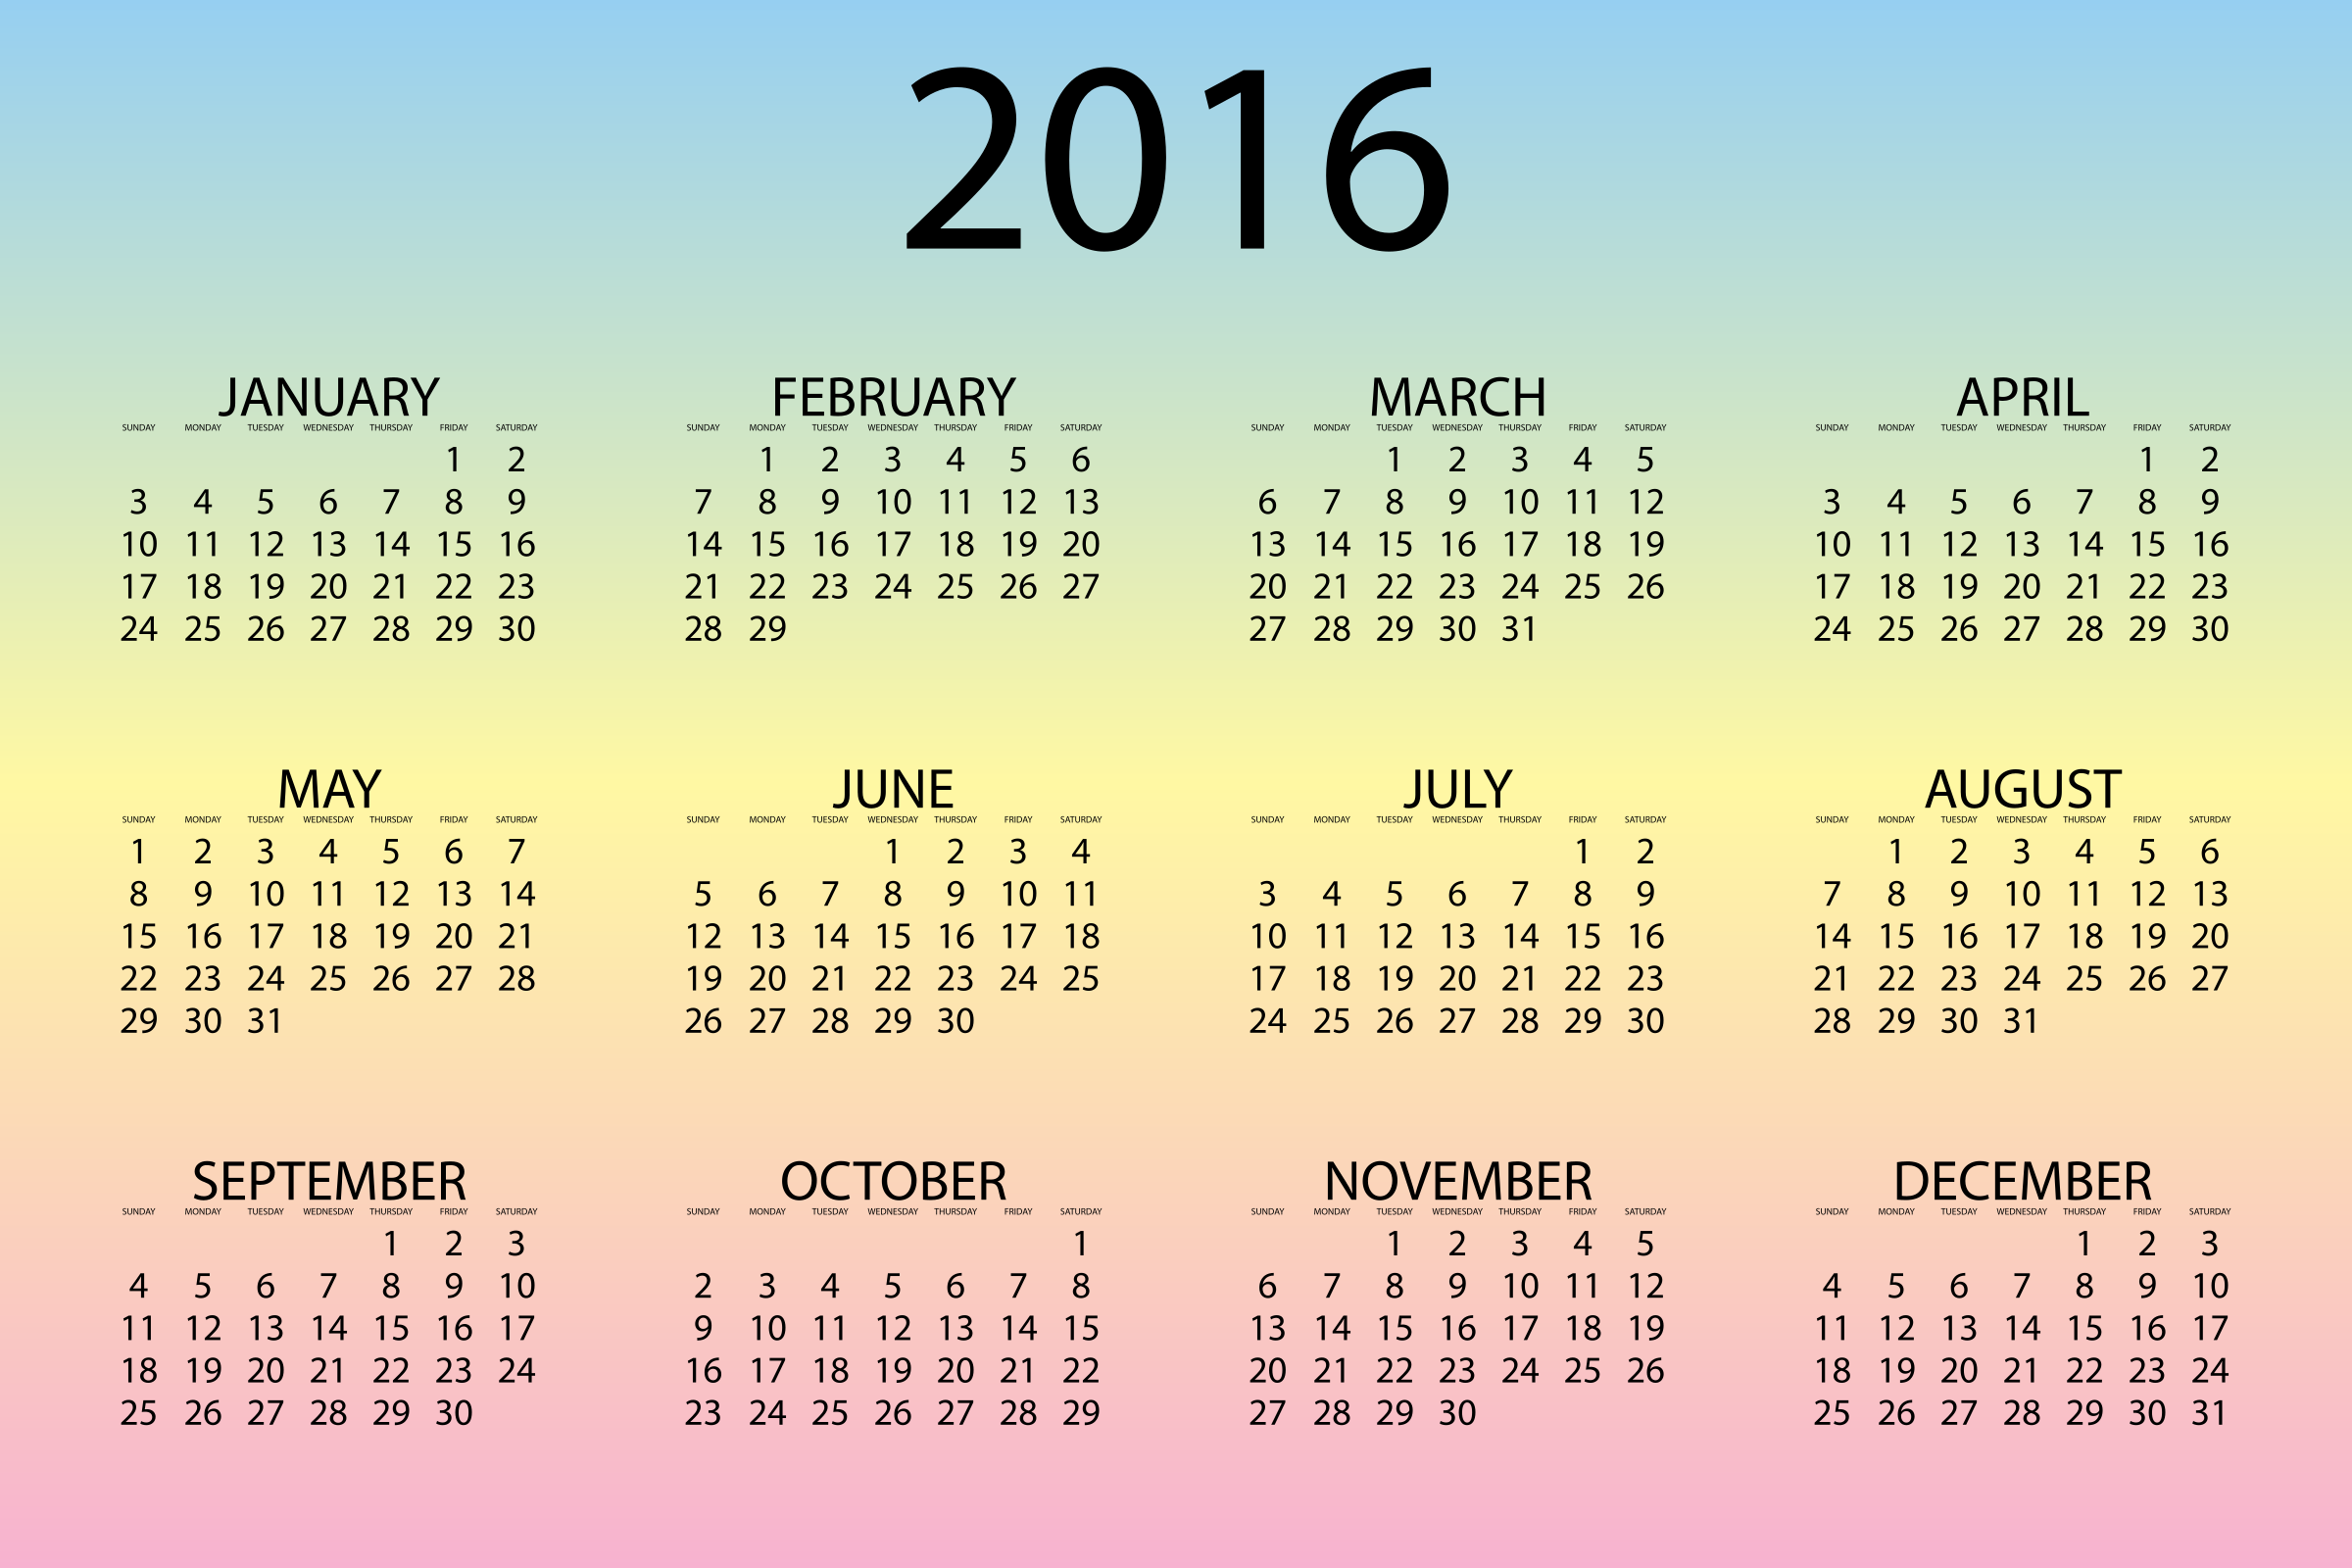 2016 calendar Pictures 2400x1600